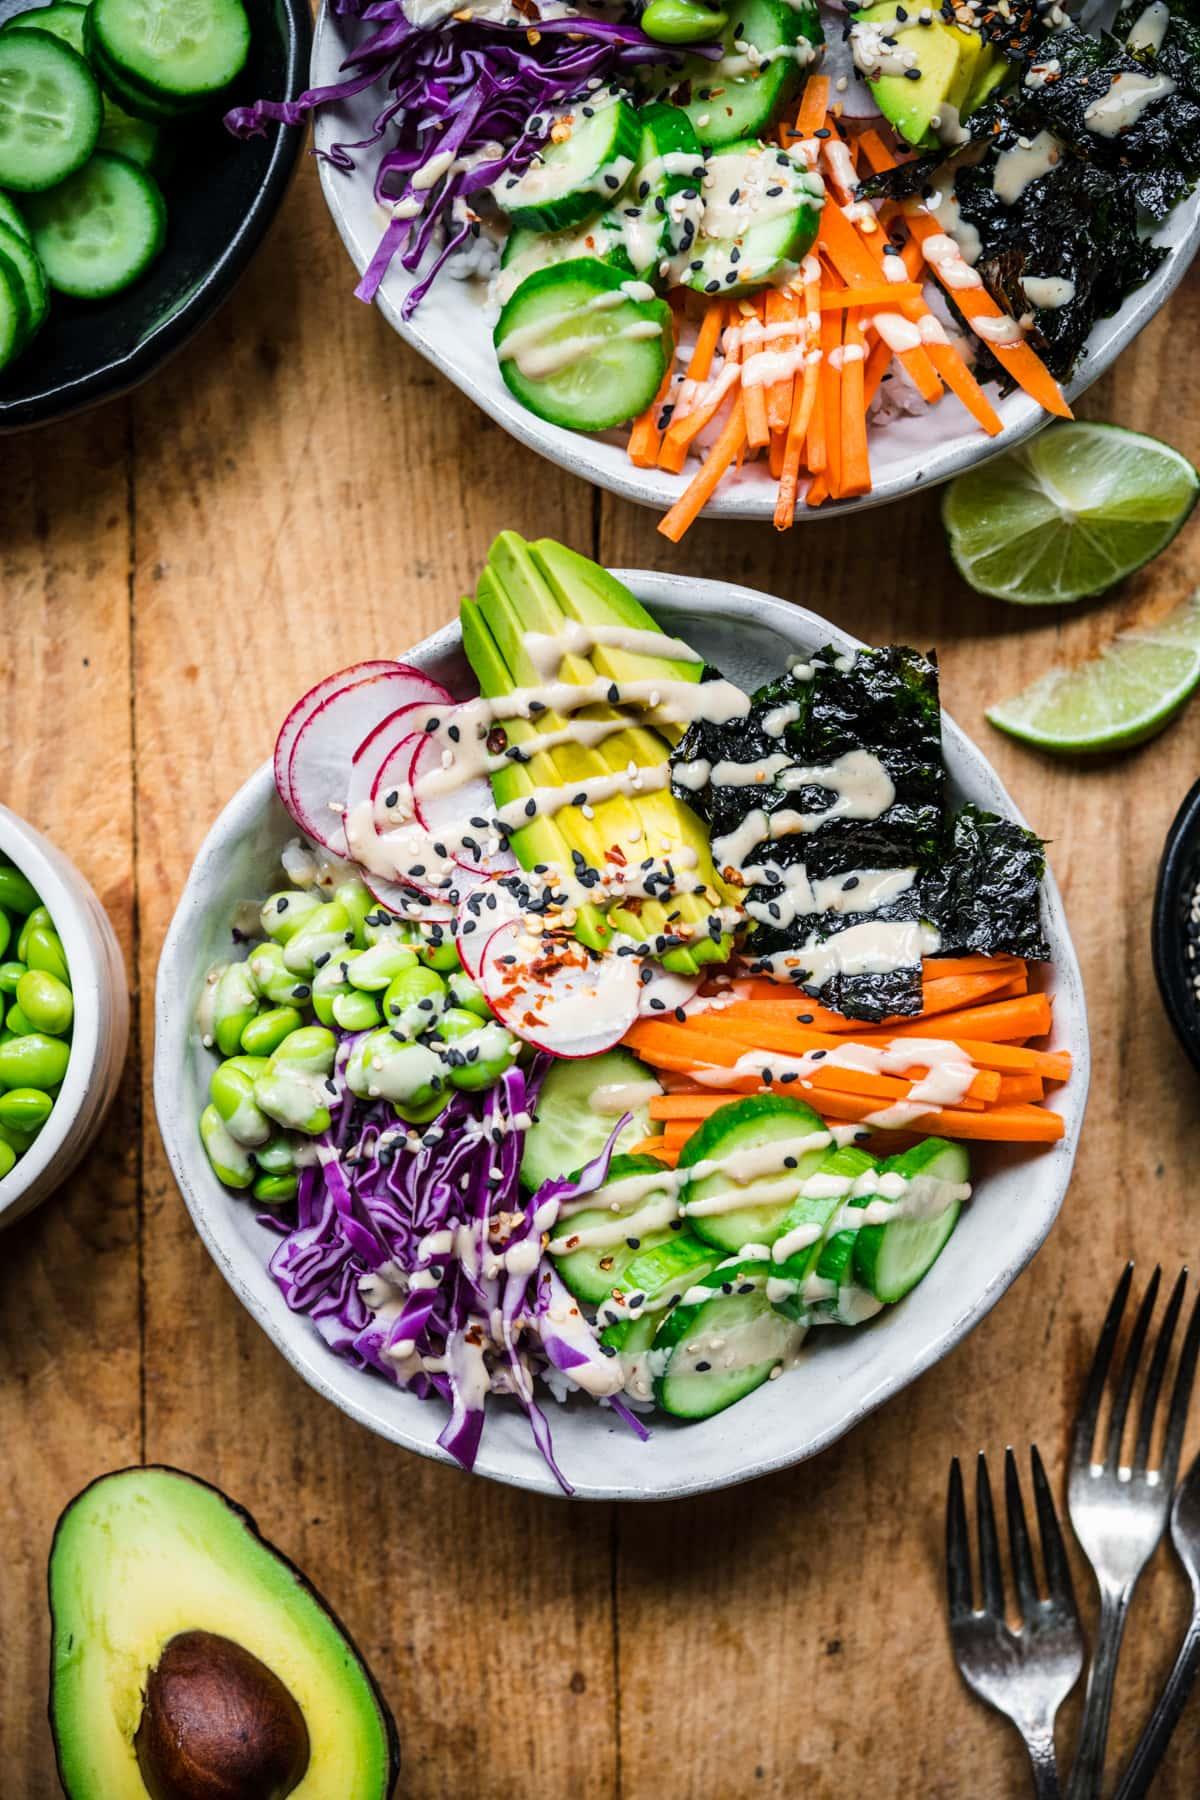 overhead view of vegan sushi bowl with avocado, radishes, cucumber, edamame and miso tahini dressing.